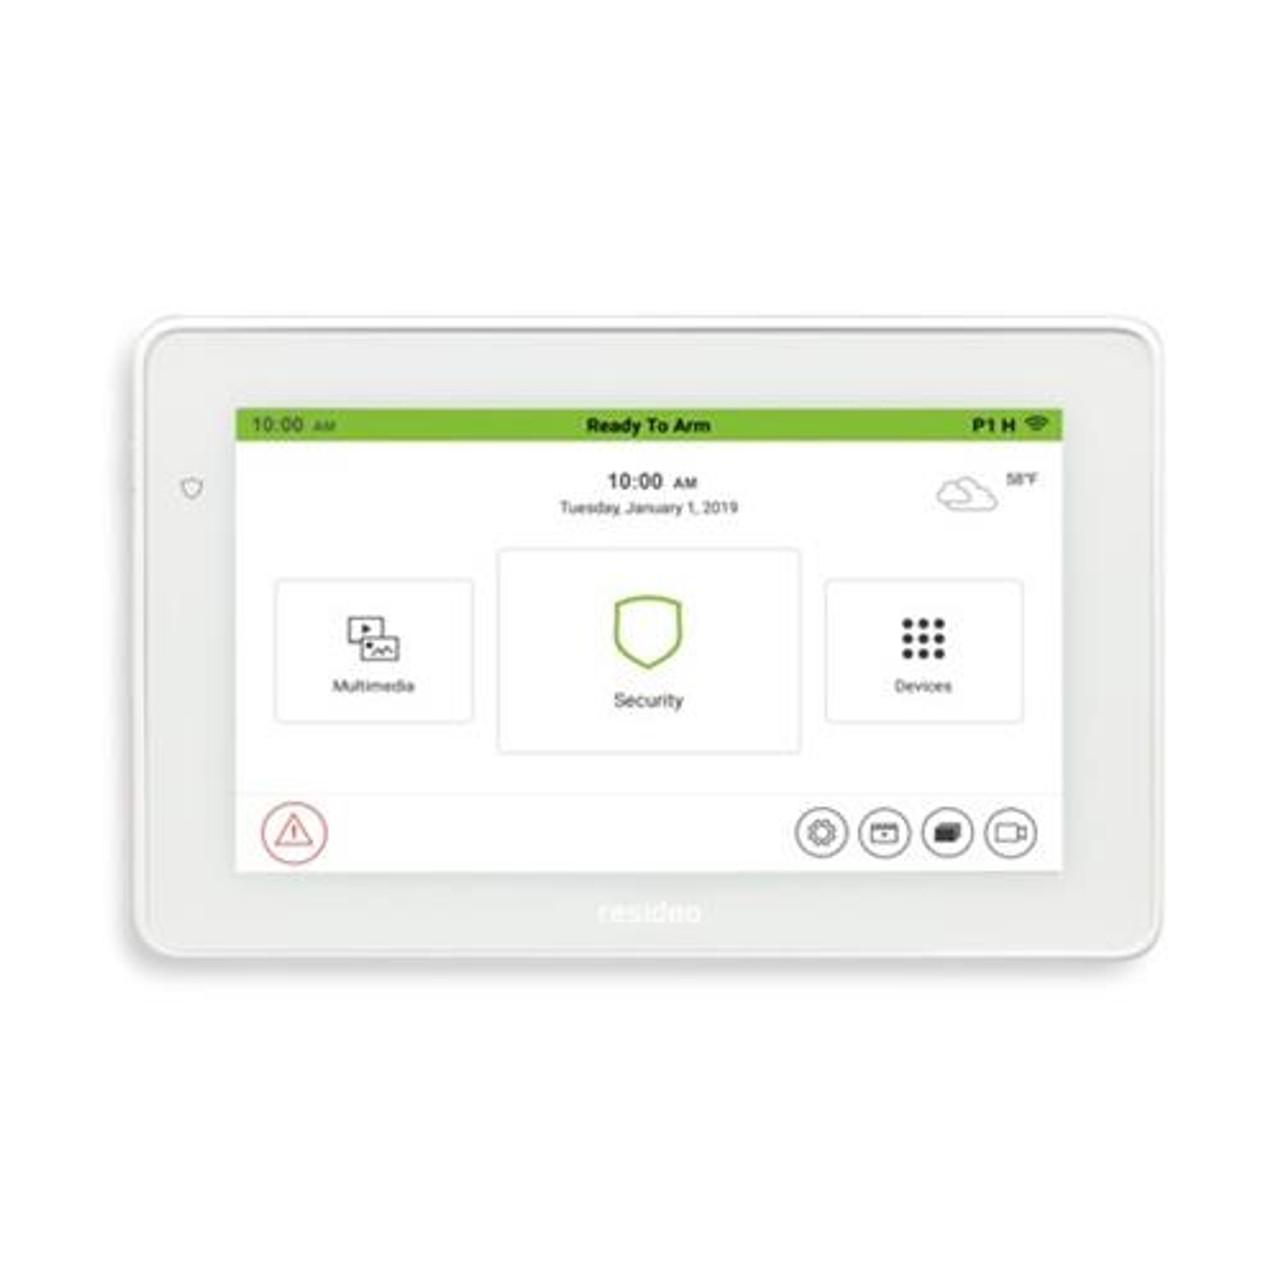 Honeywell Tuxedo Touchscreen Keypad and Smart Controller